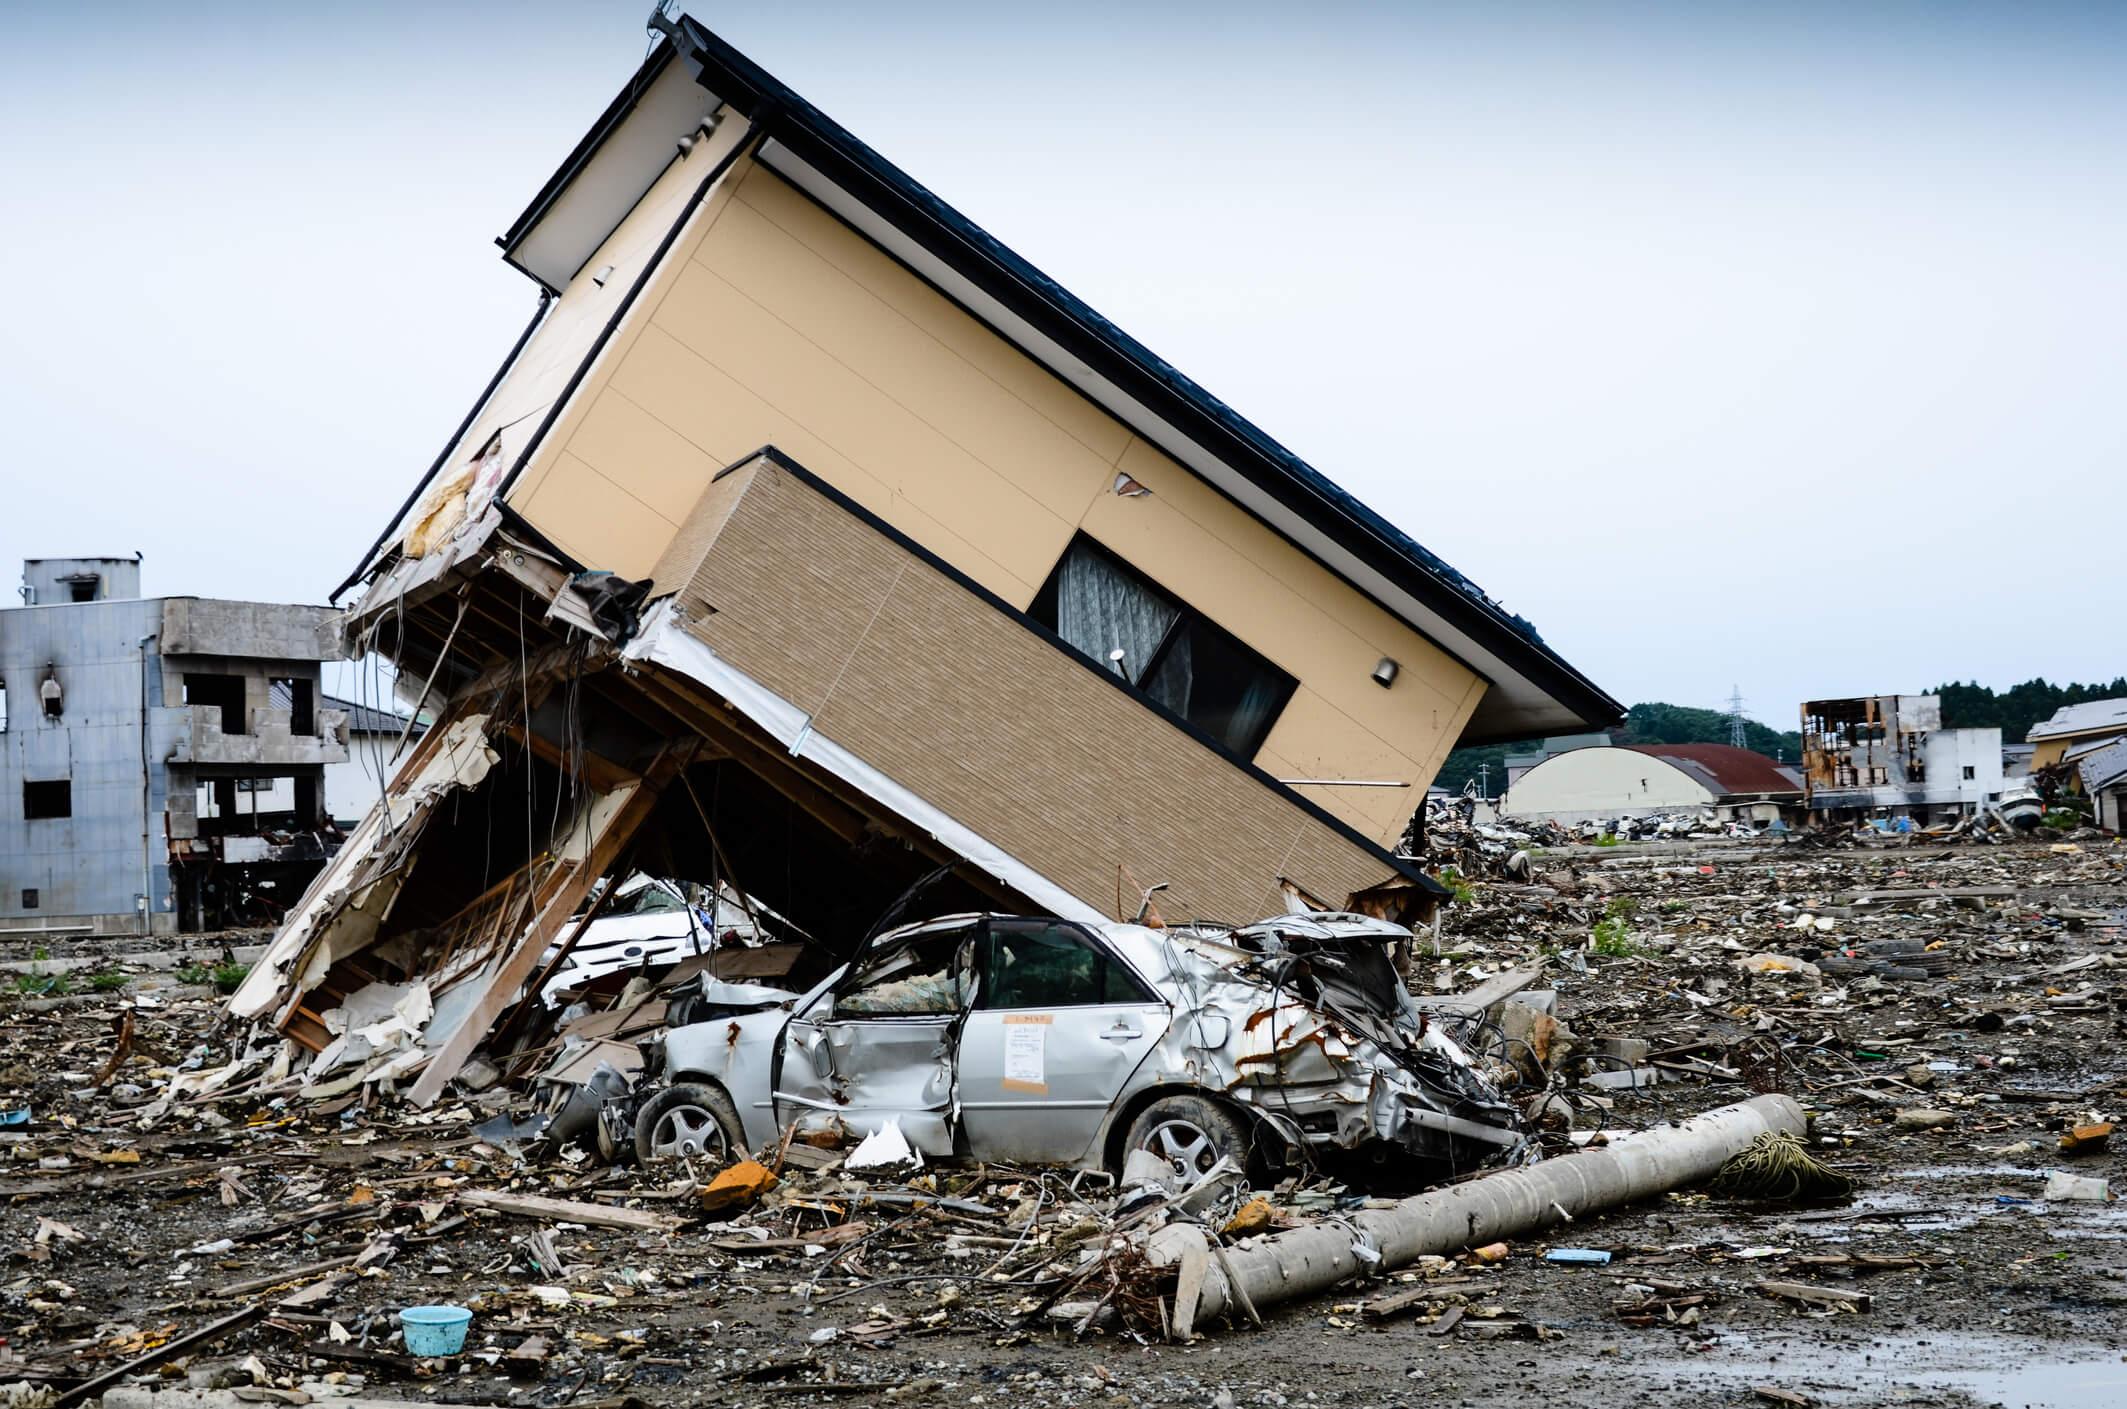 destruction in Tohoku March 2011